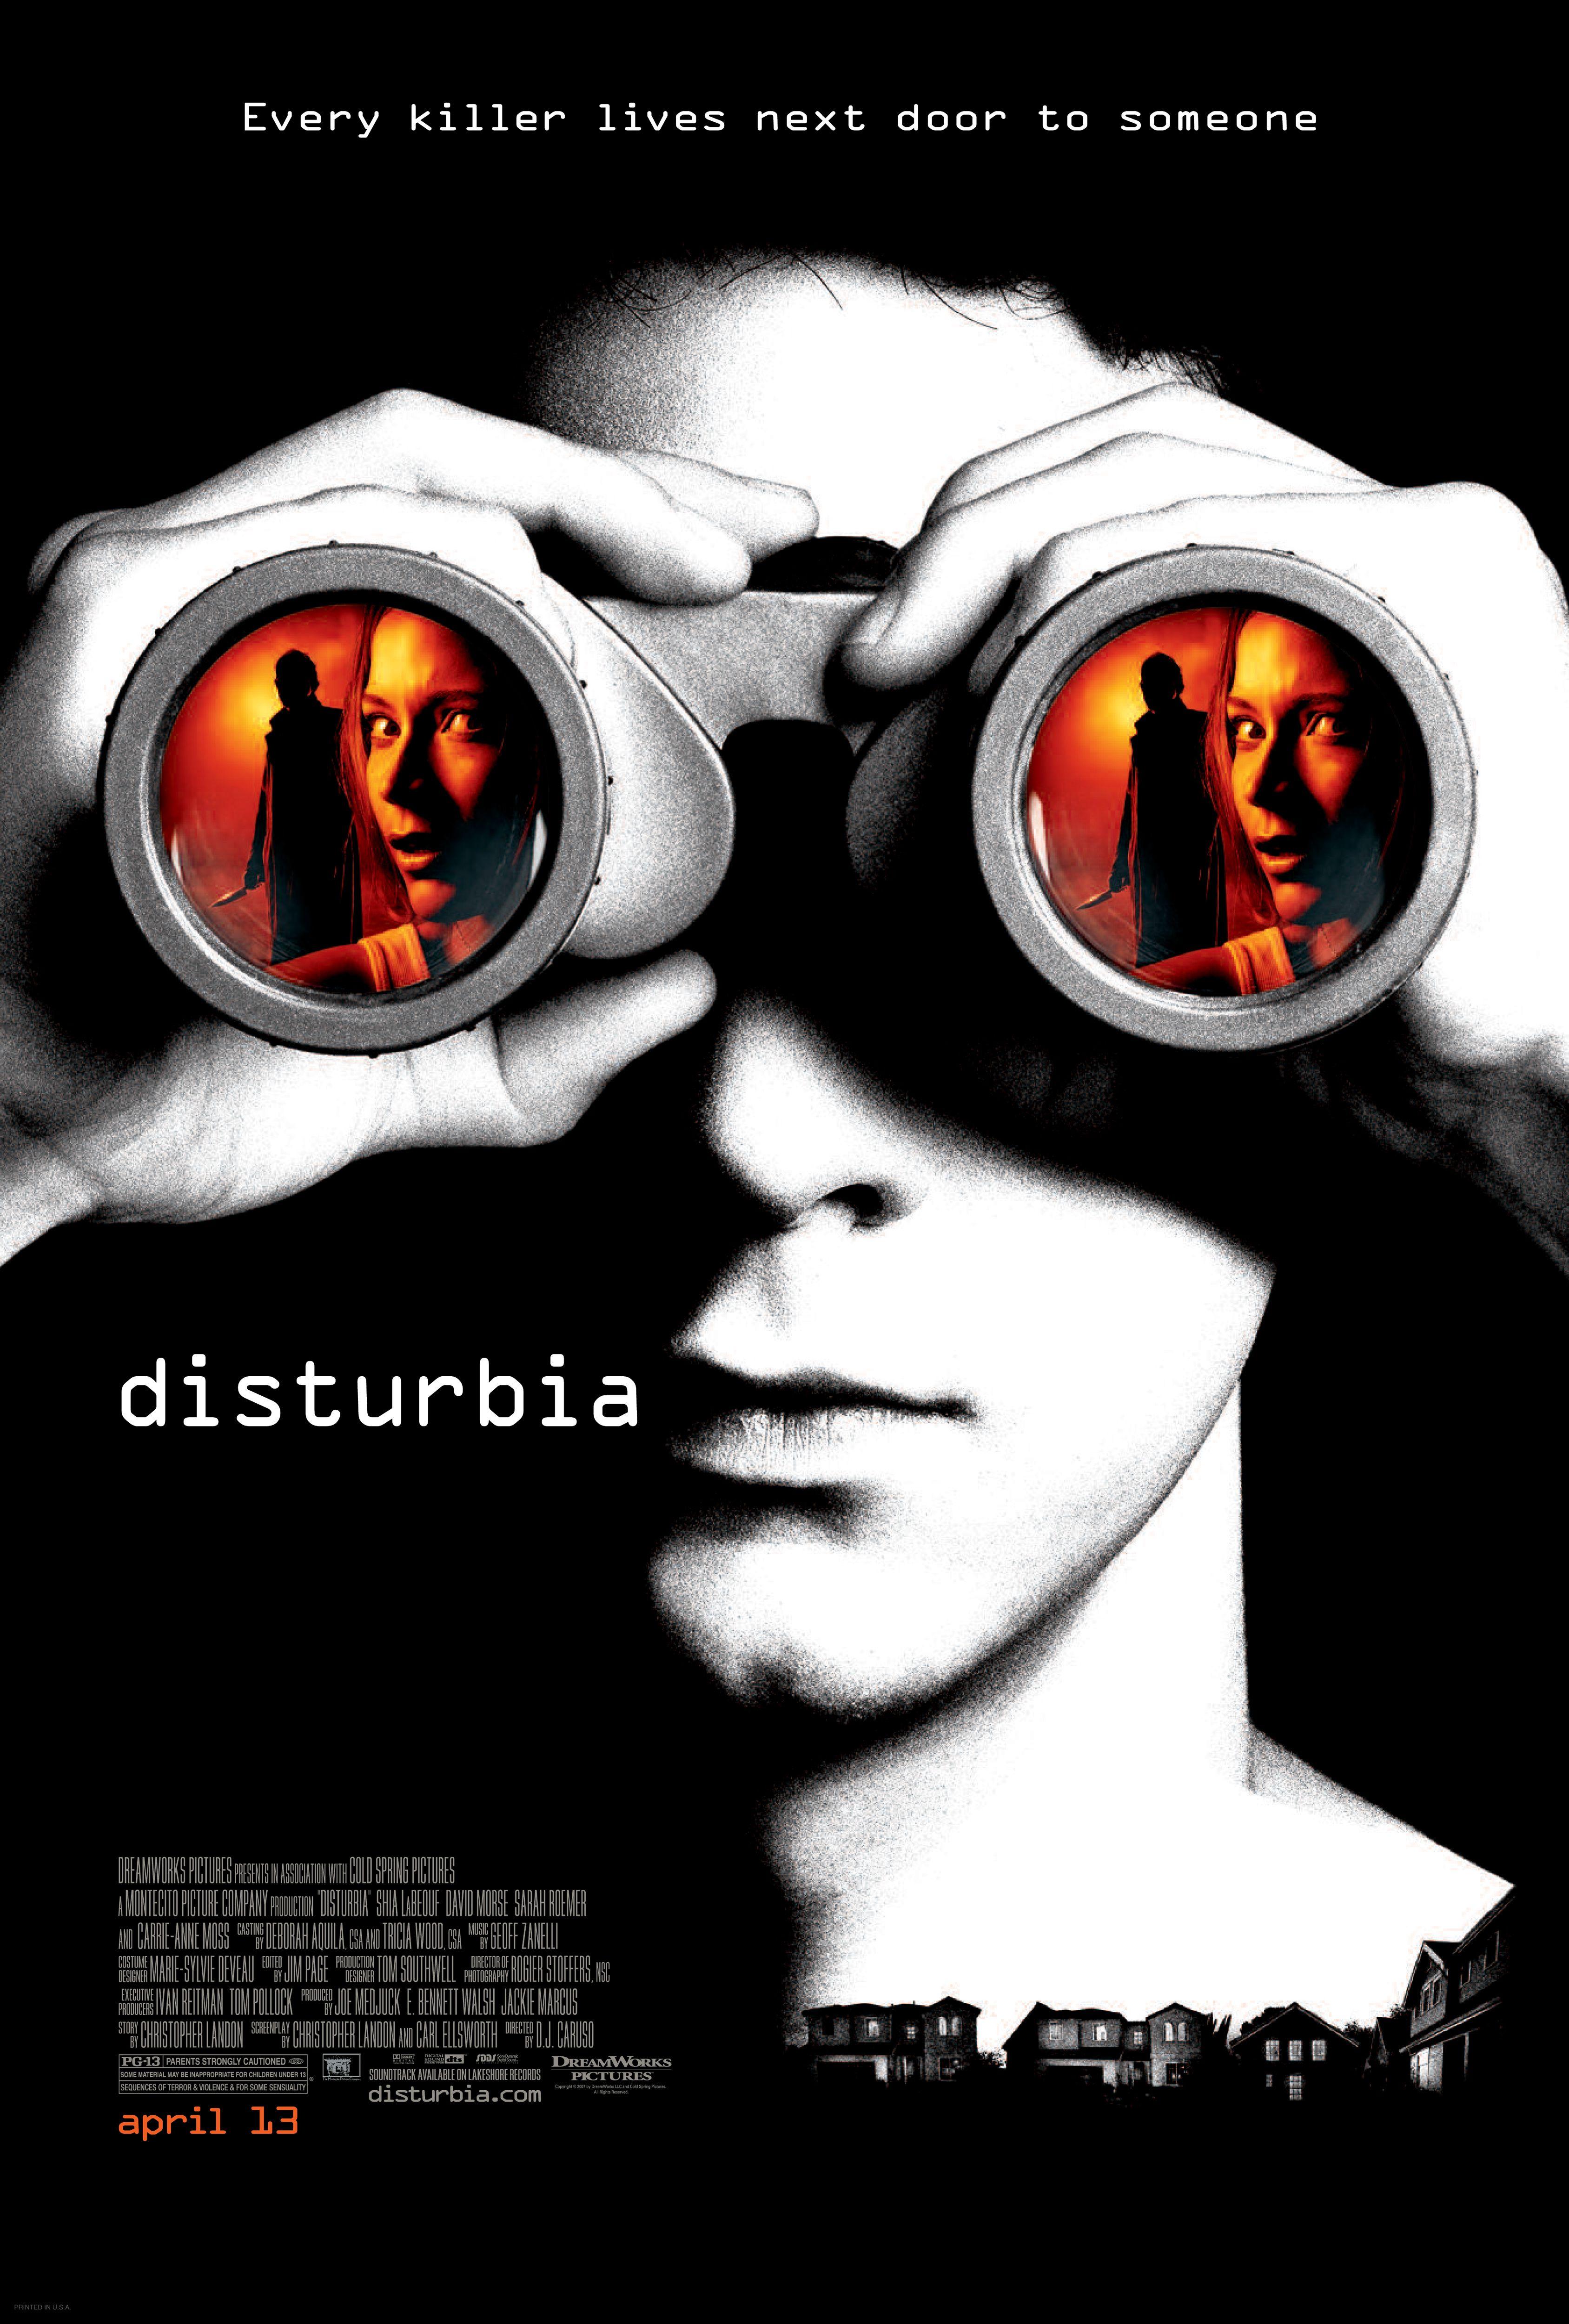 Disturbia 2007 Paranoia Disturbia Film Thriller Movies